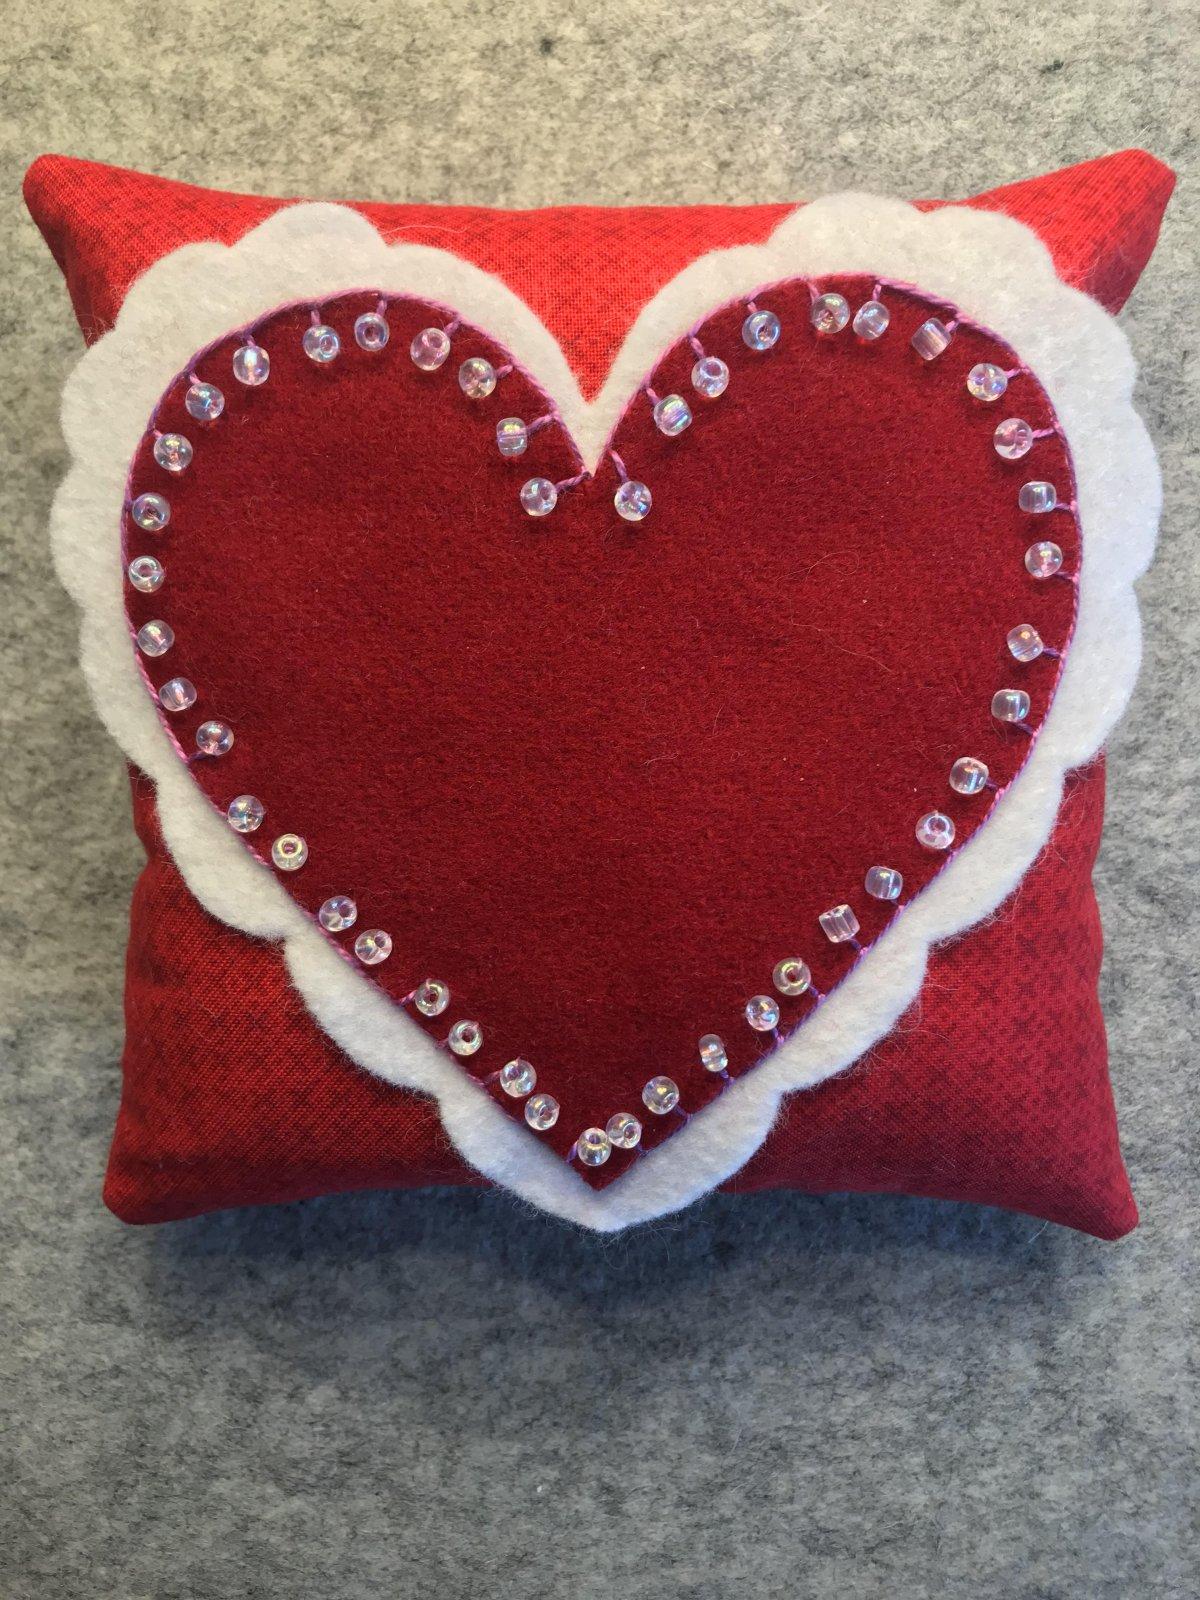 February Pincushion of the Month:  Heart Wool Pincushion